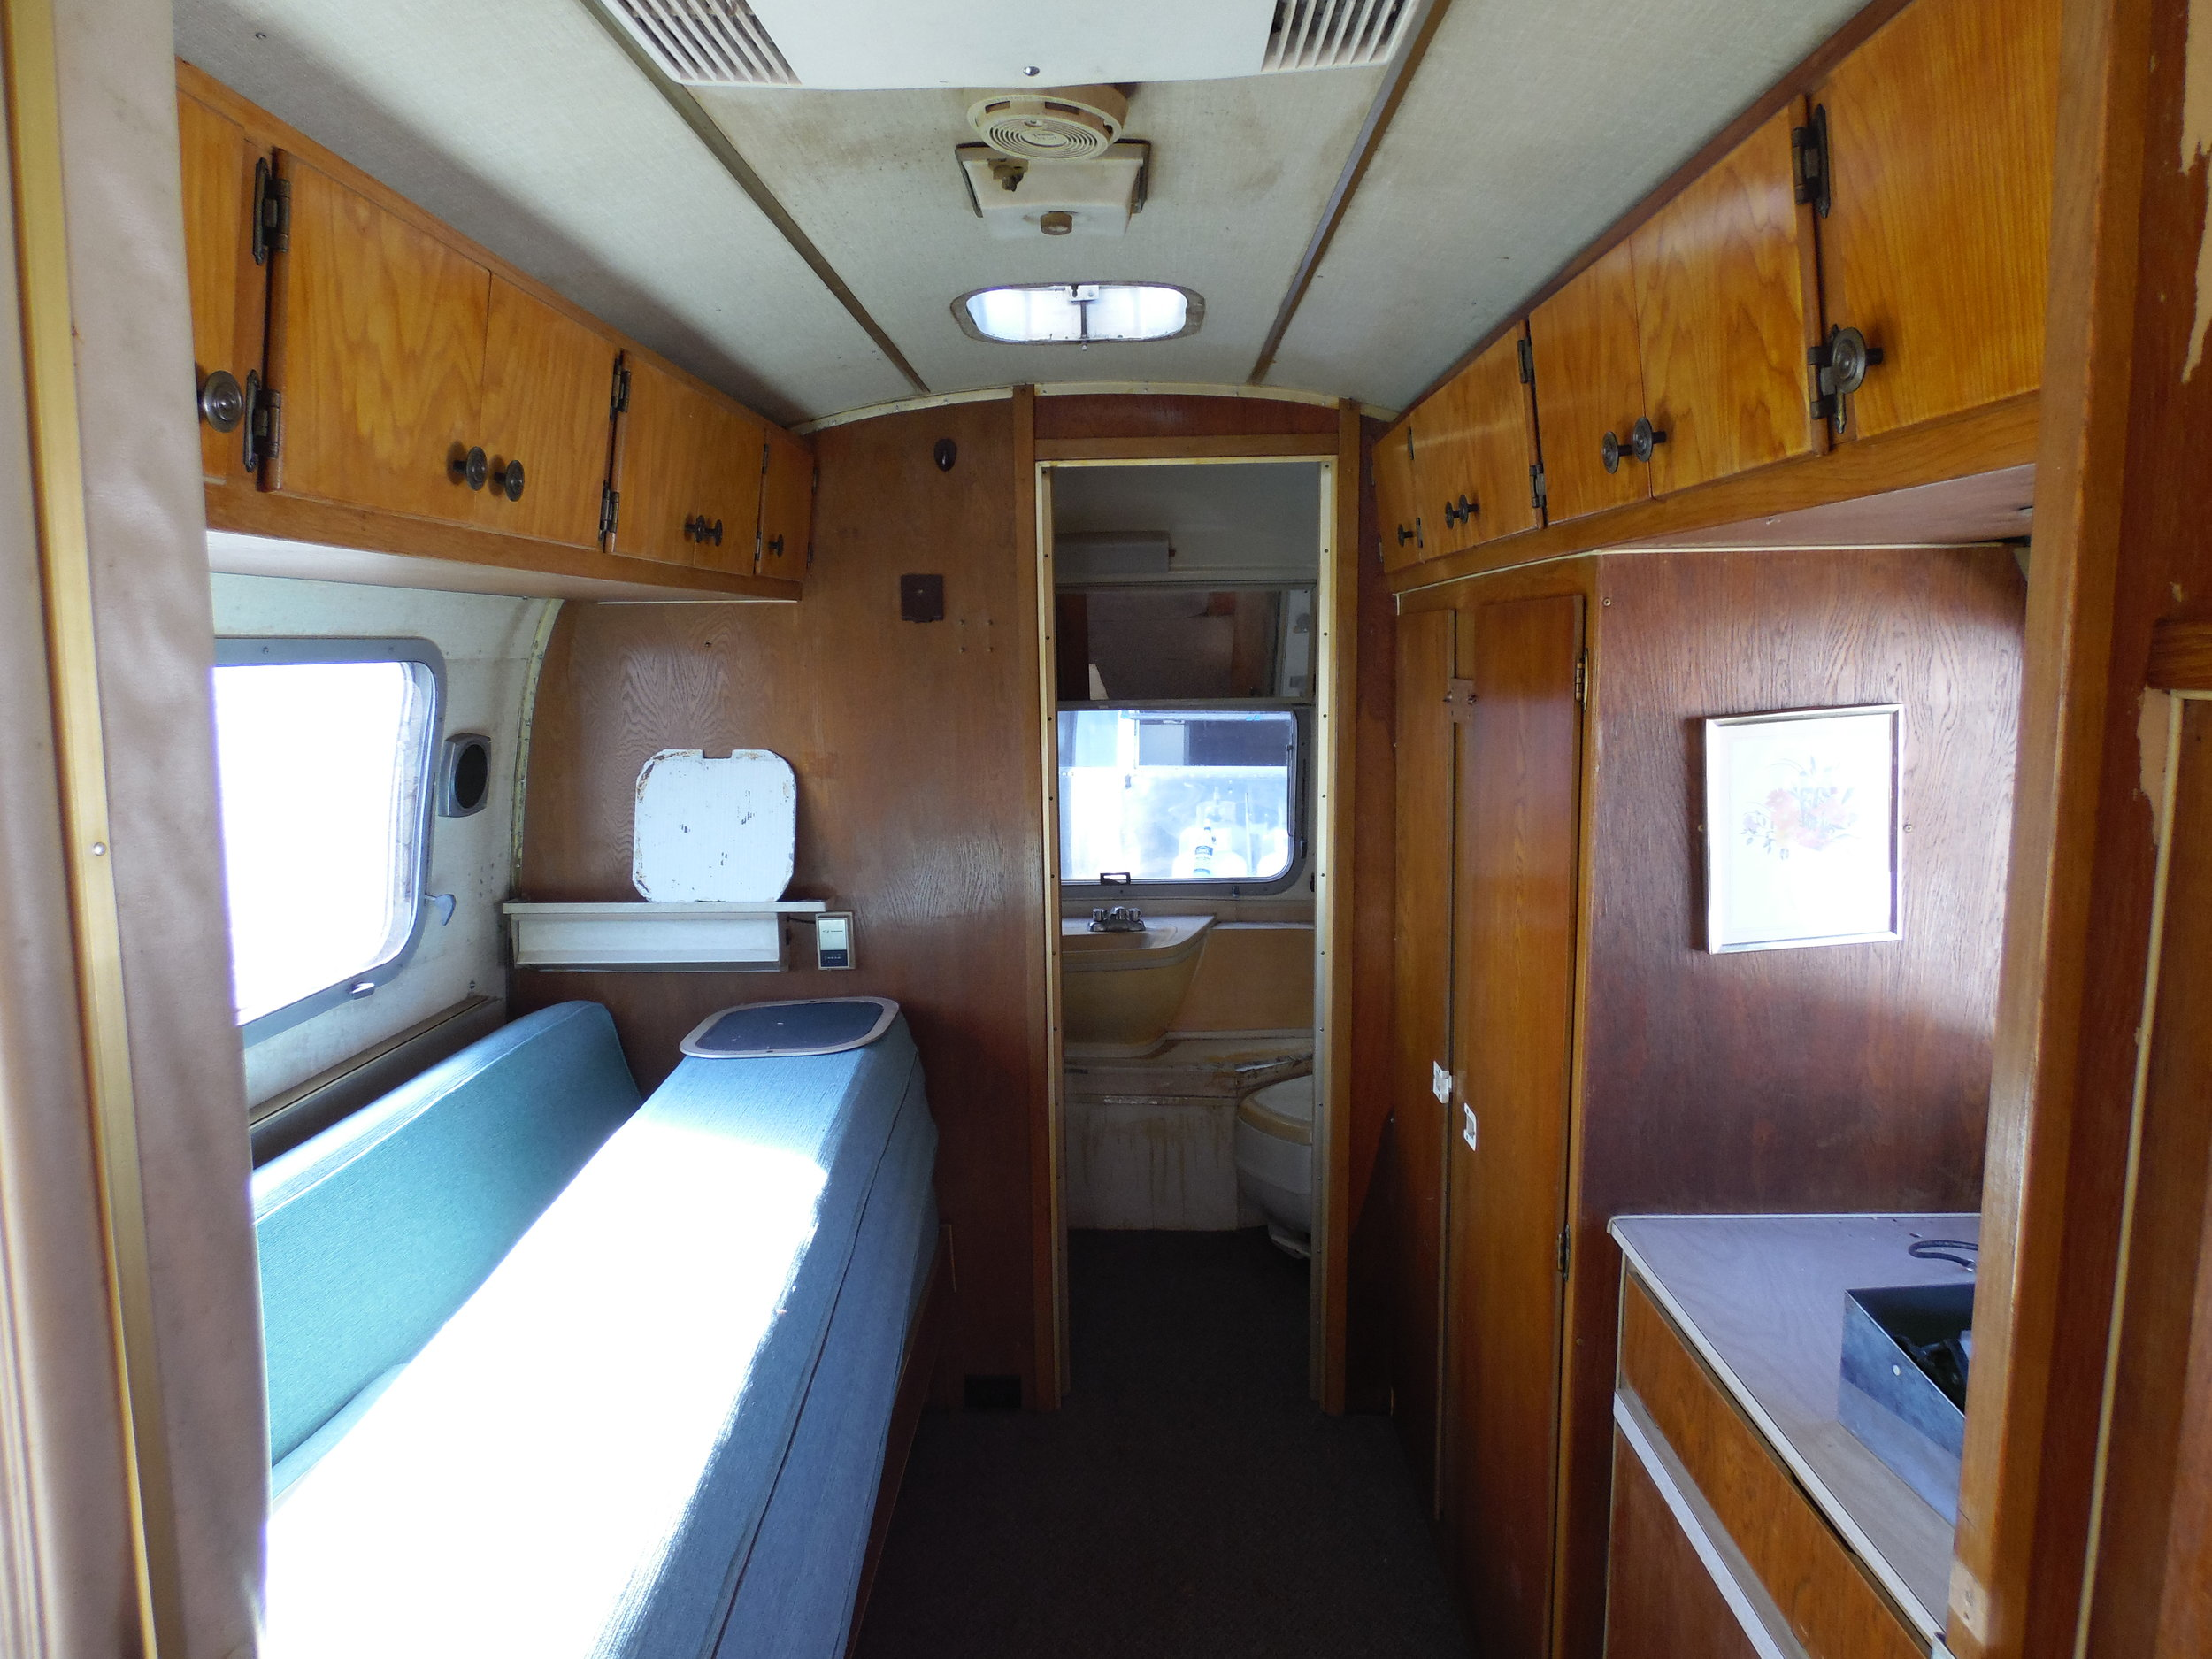 1970 Airstream Overlander